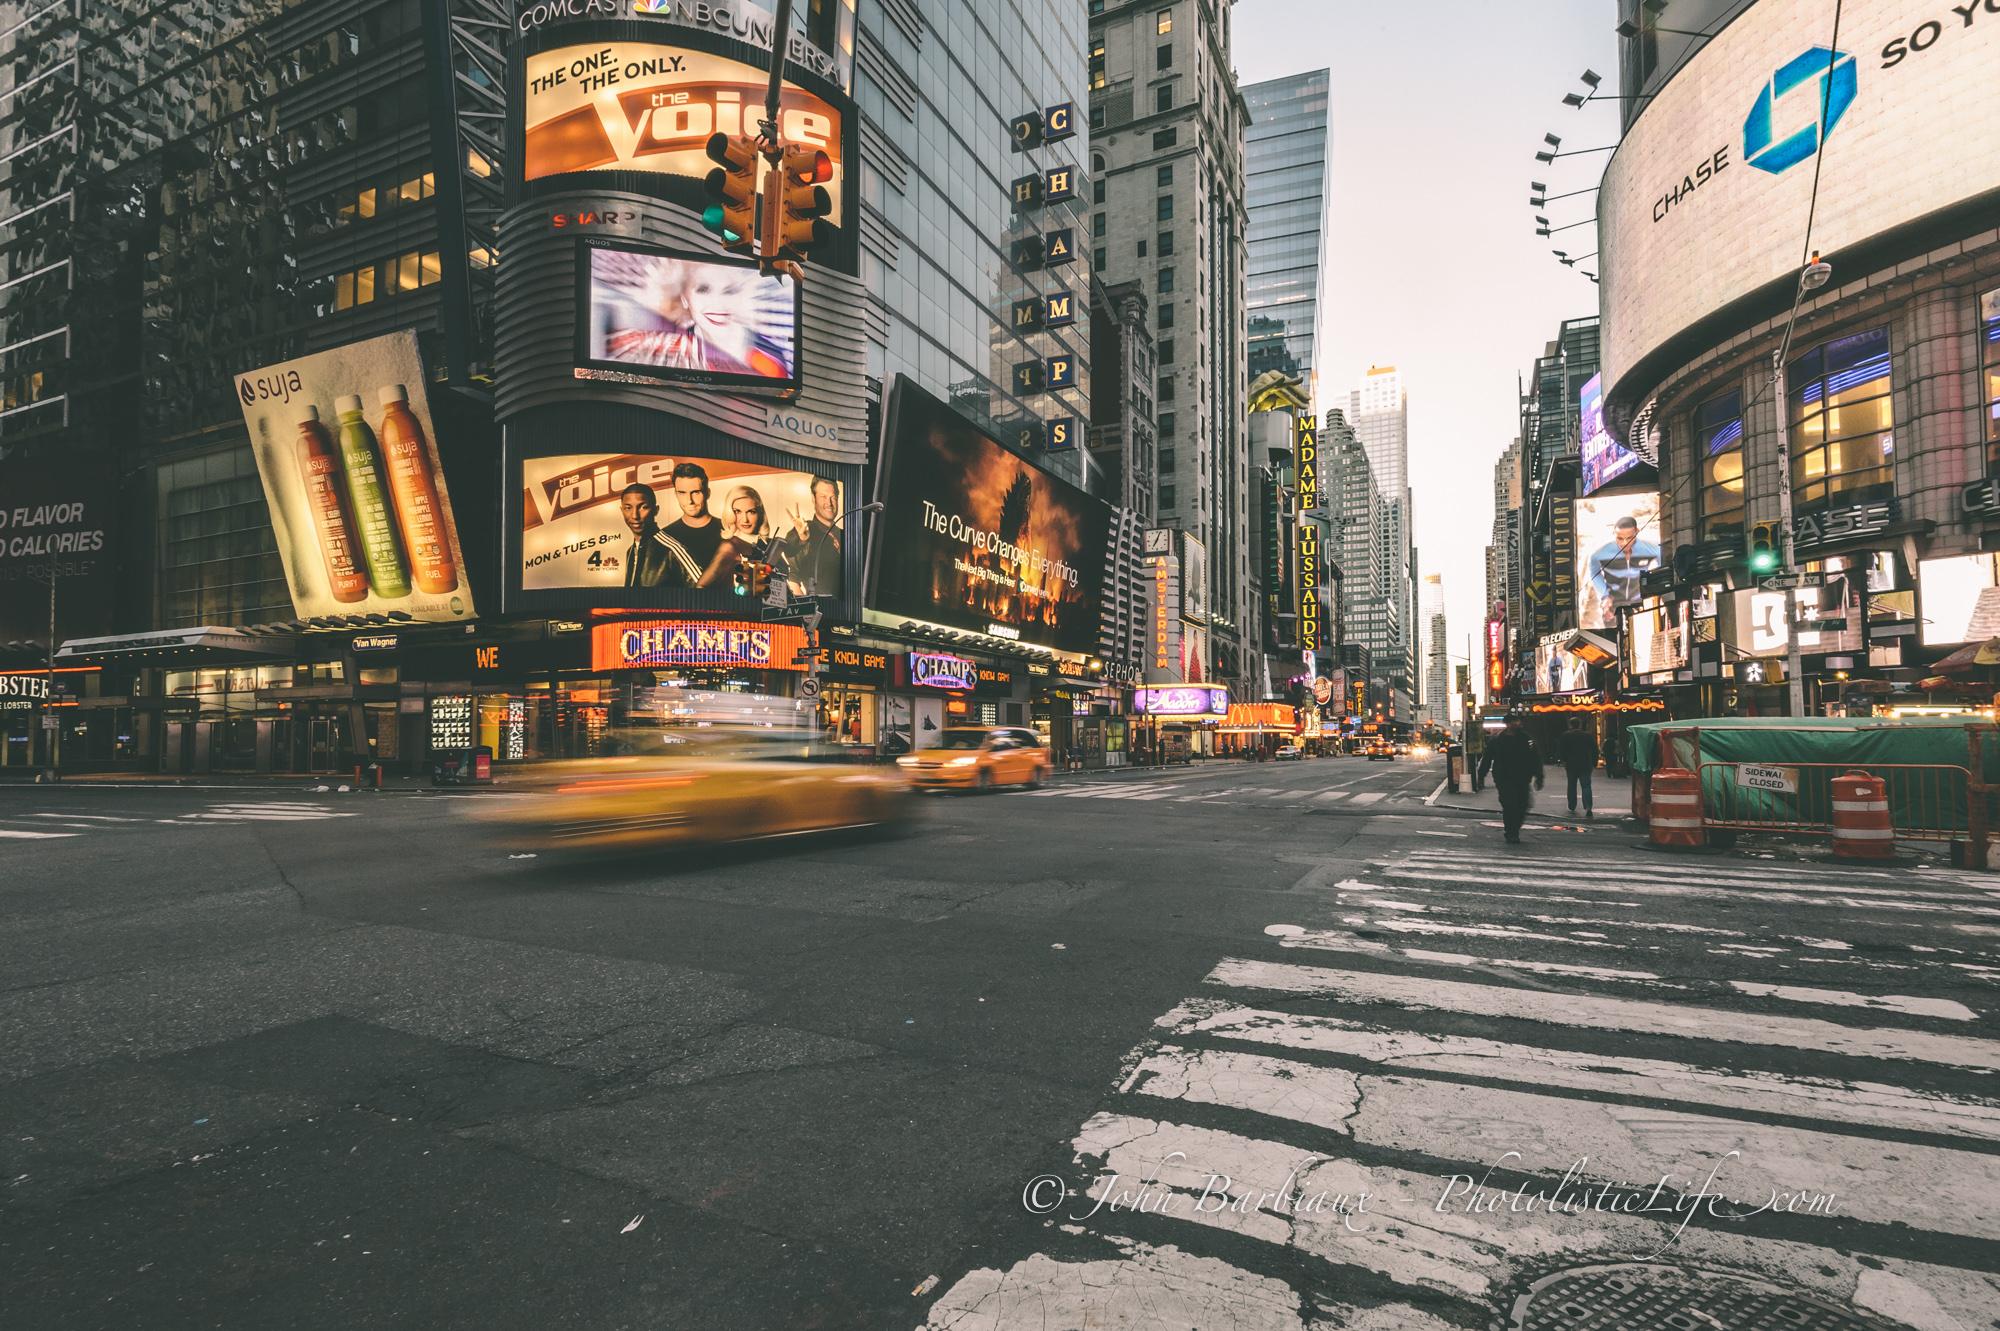 New York Town Car Reviews